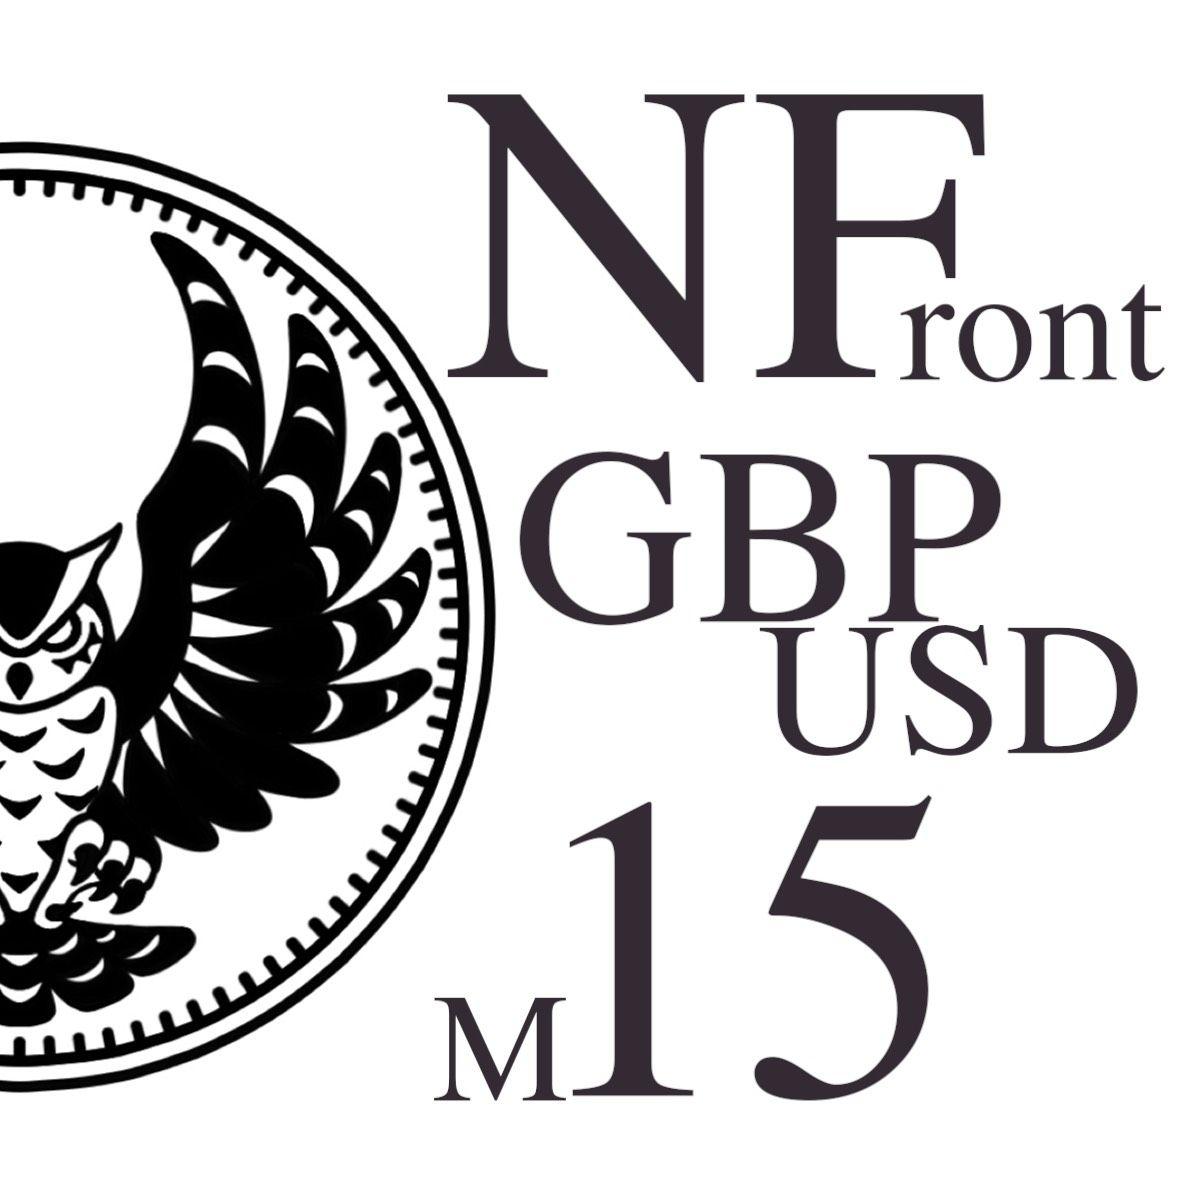 NFront_GBPUSD_M15